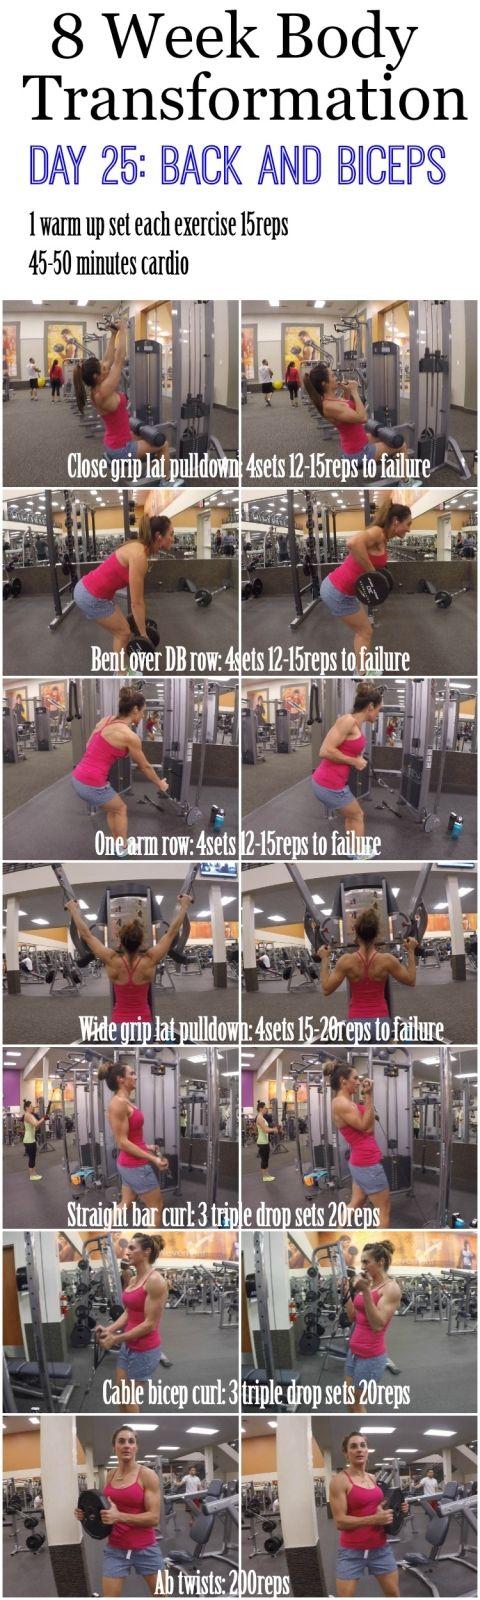 8 Week Body Transformation Day 25 Back/Biceps